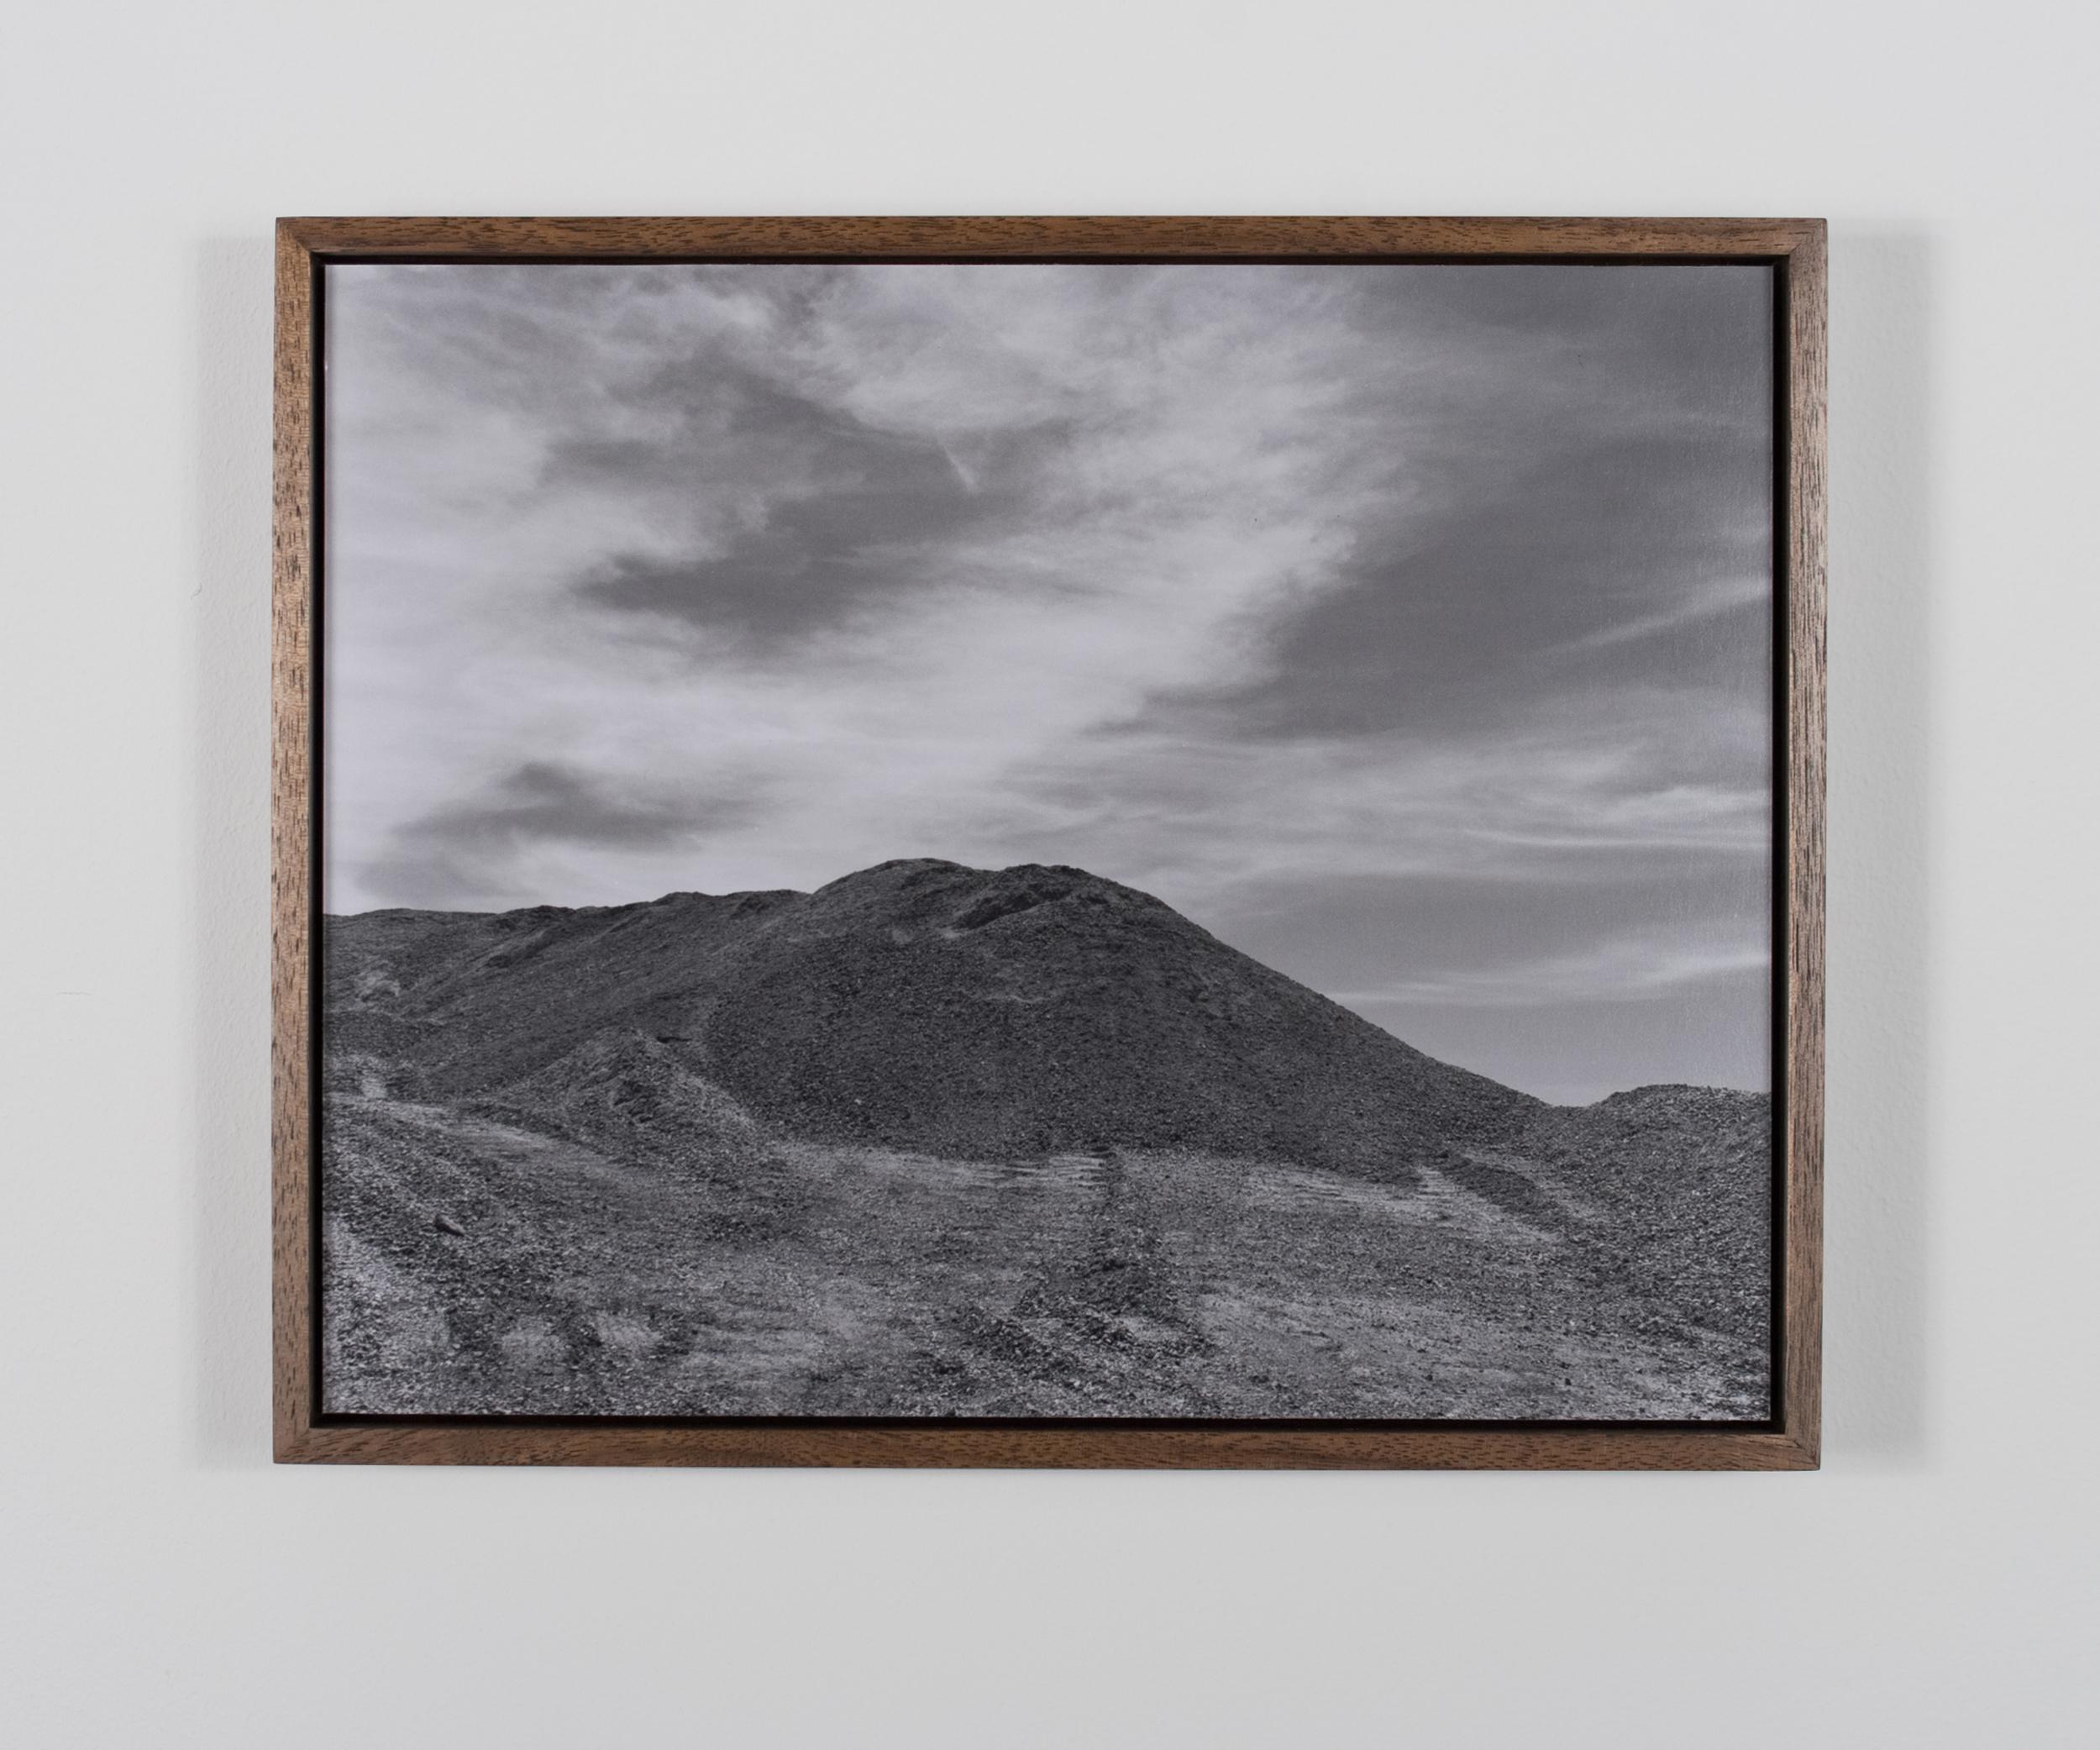 Mount Perfidy (aka Túmulo de La Mesa) 2009/10 Gelatin-silver print on Dibond, with walnut frame